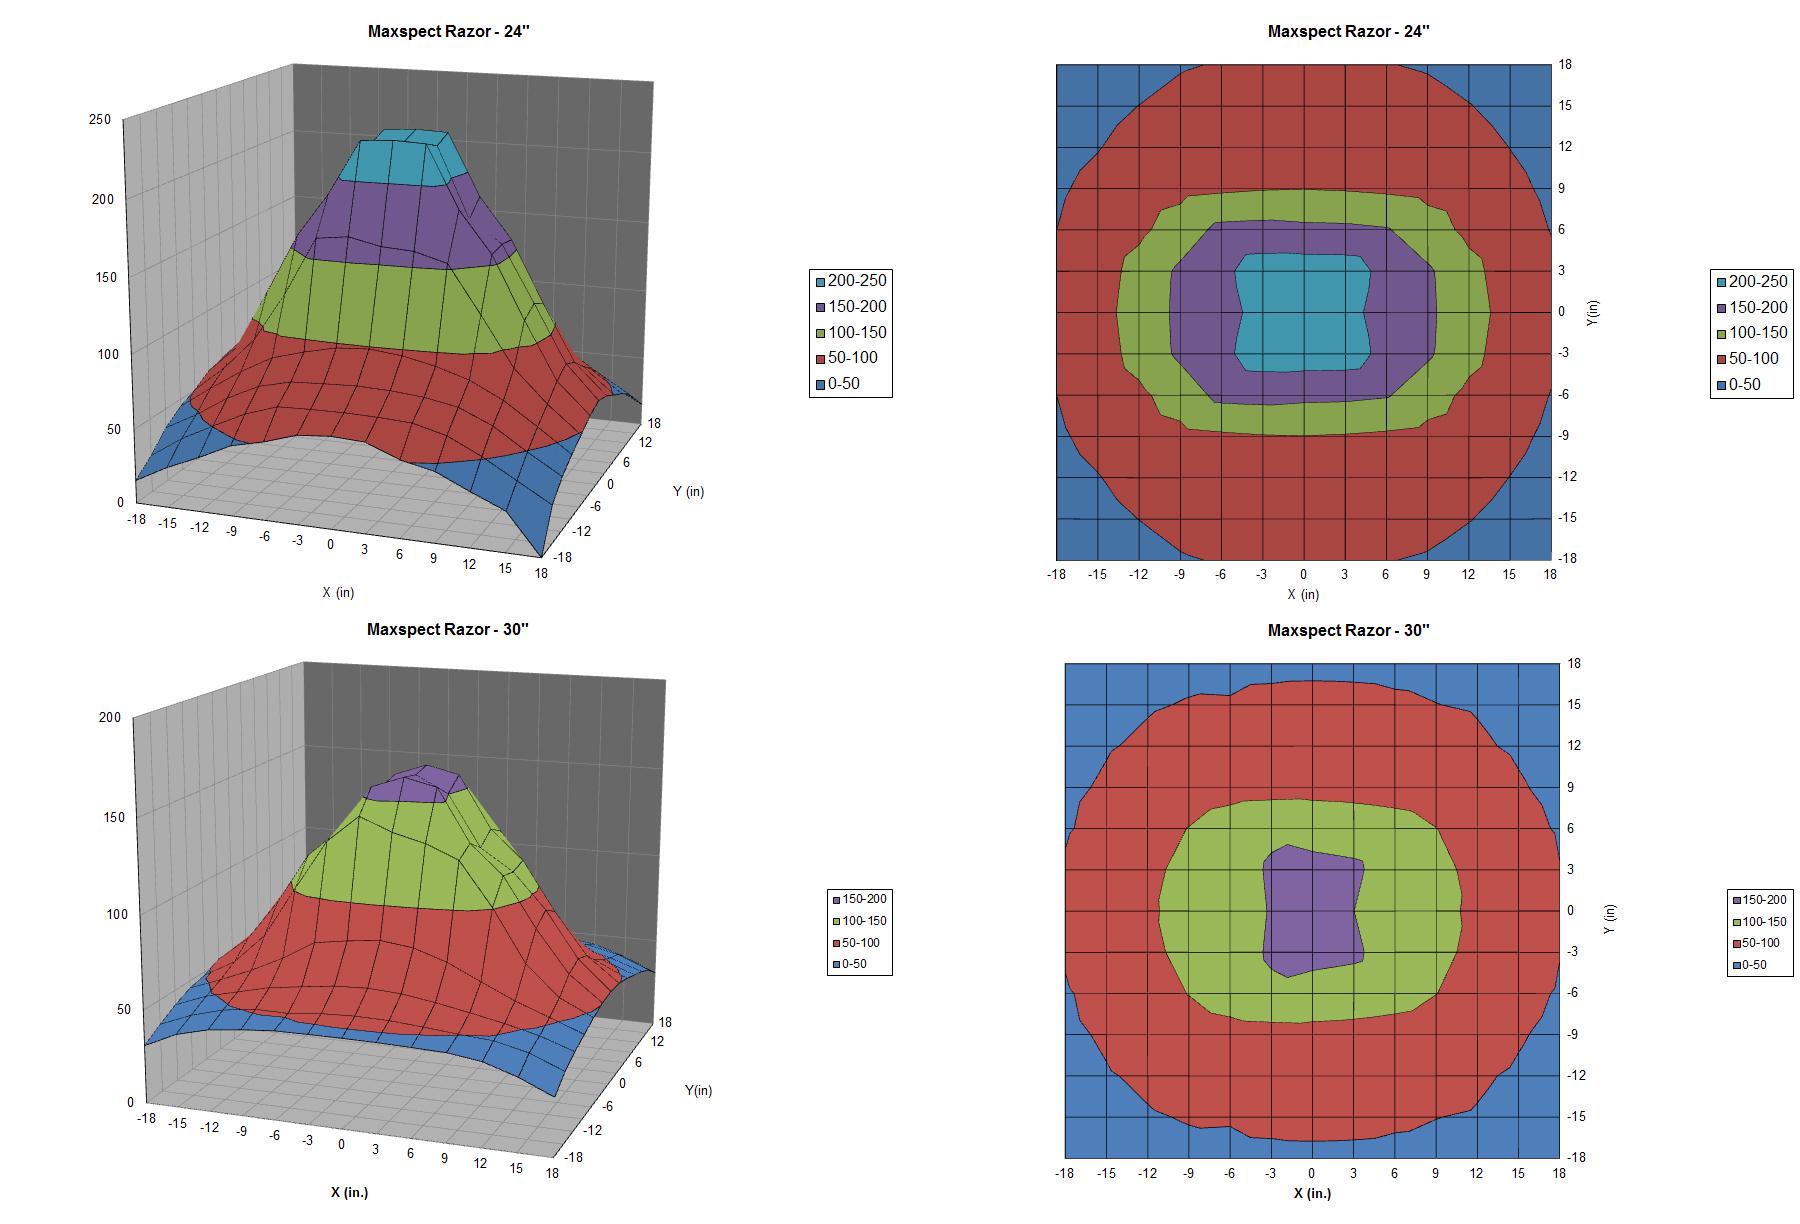 figure_3_maxspect_razor_par_distribution.jpg